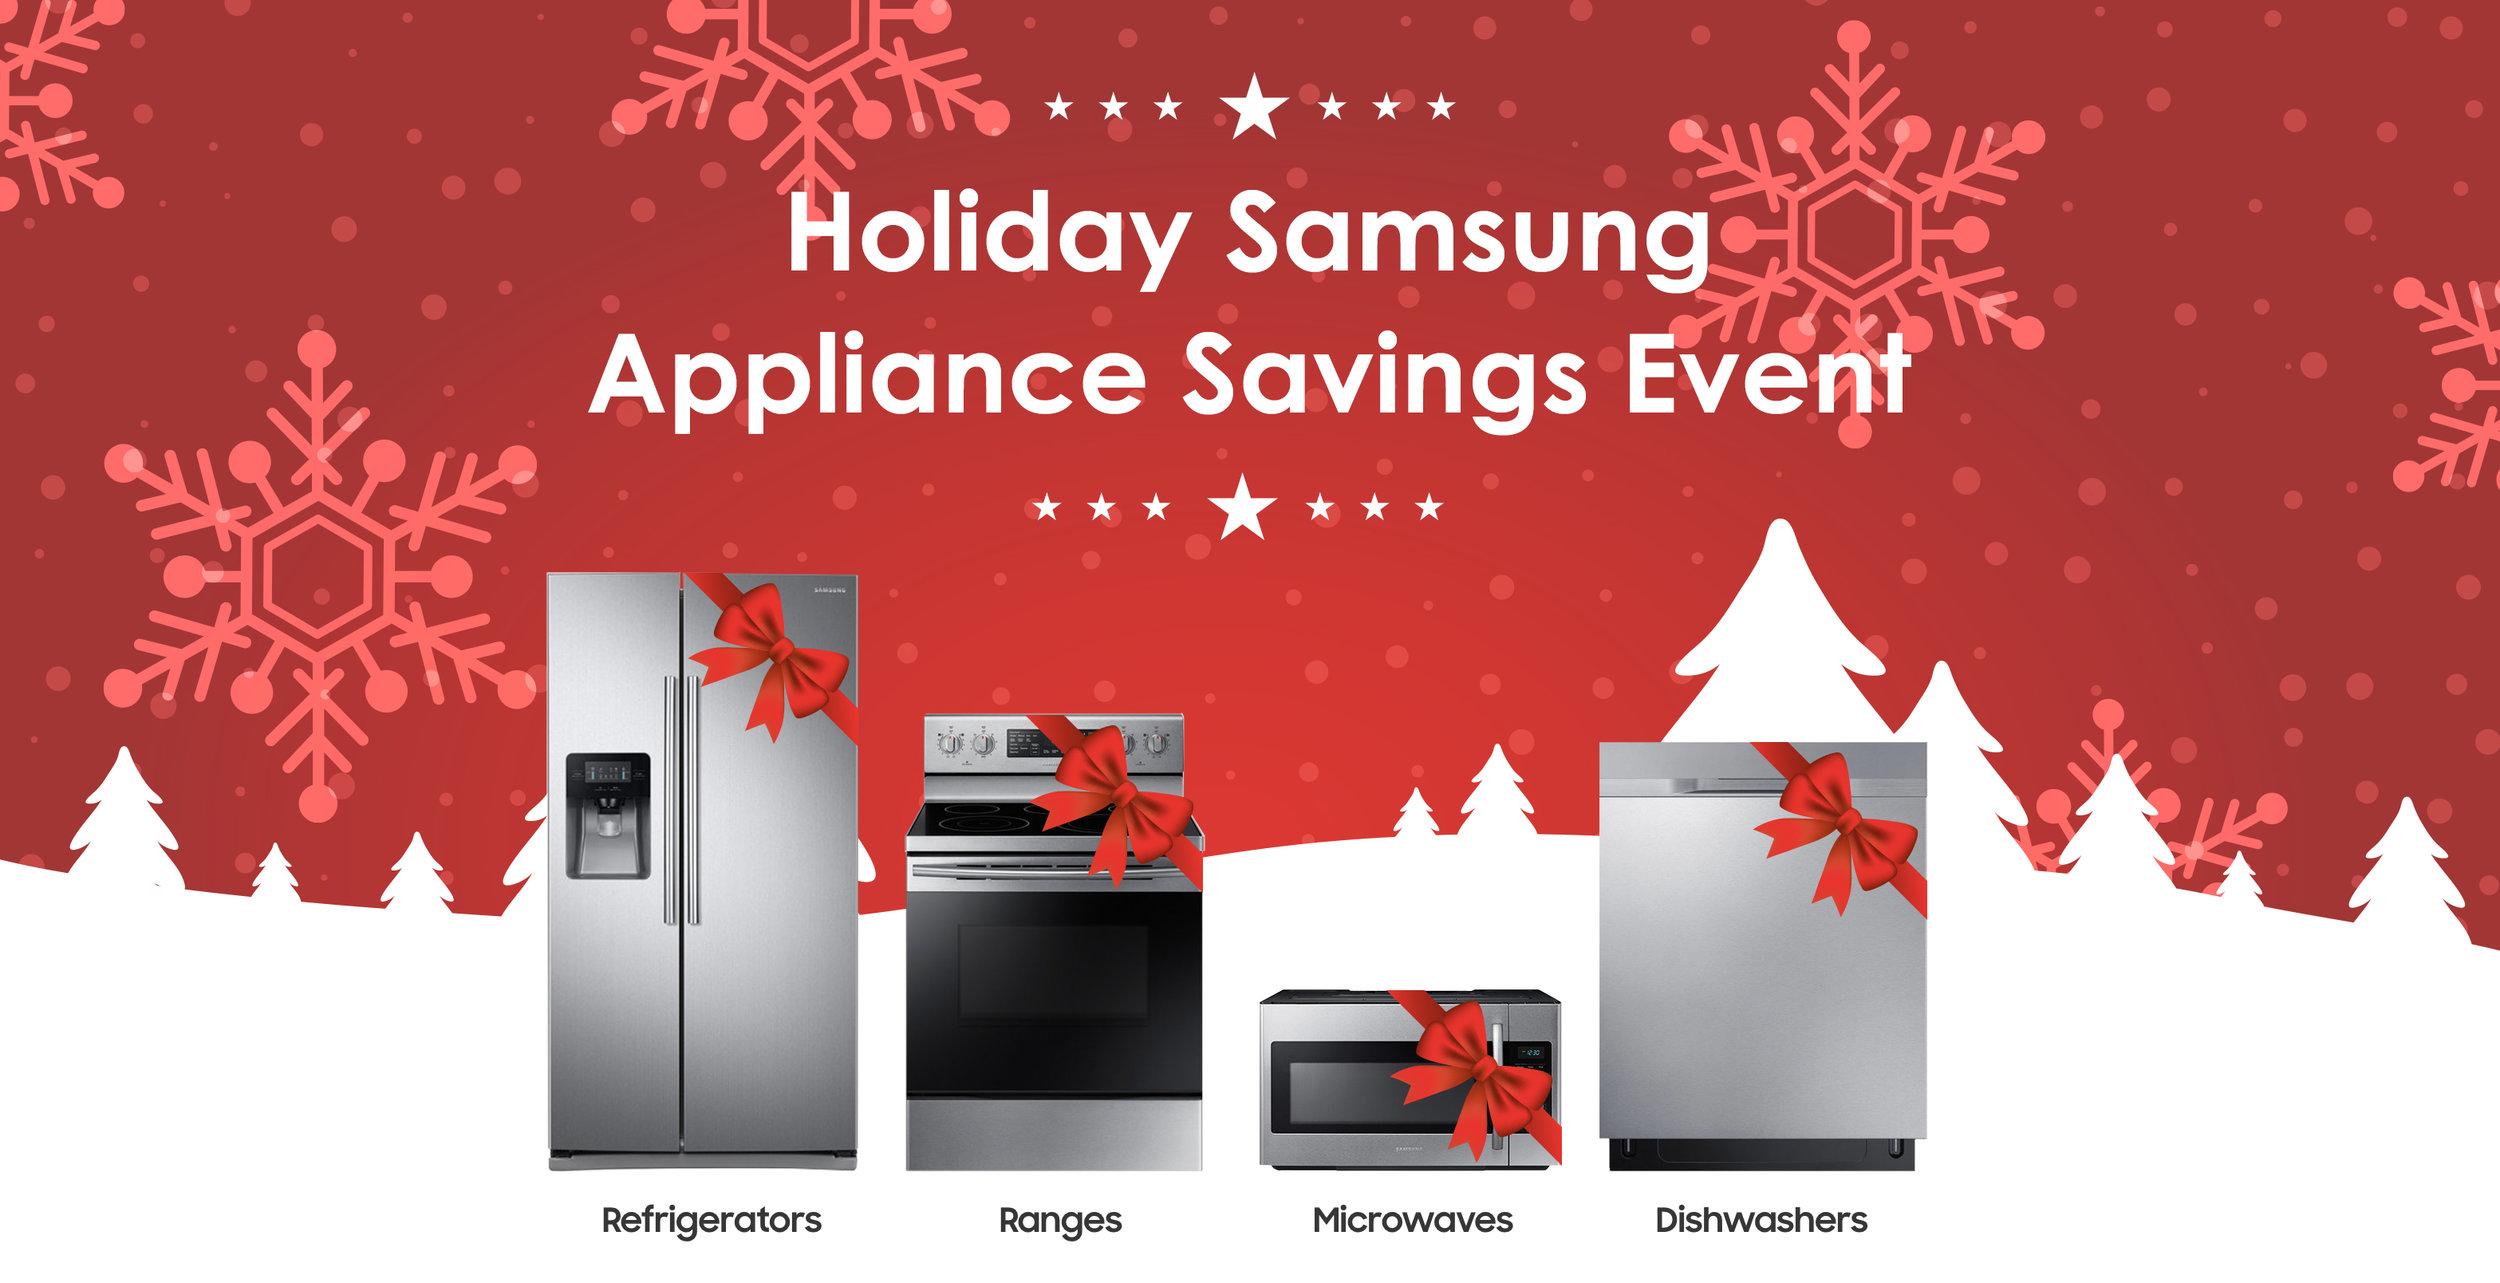 Appliances3.jpg